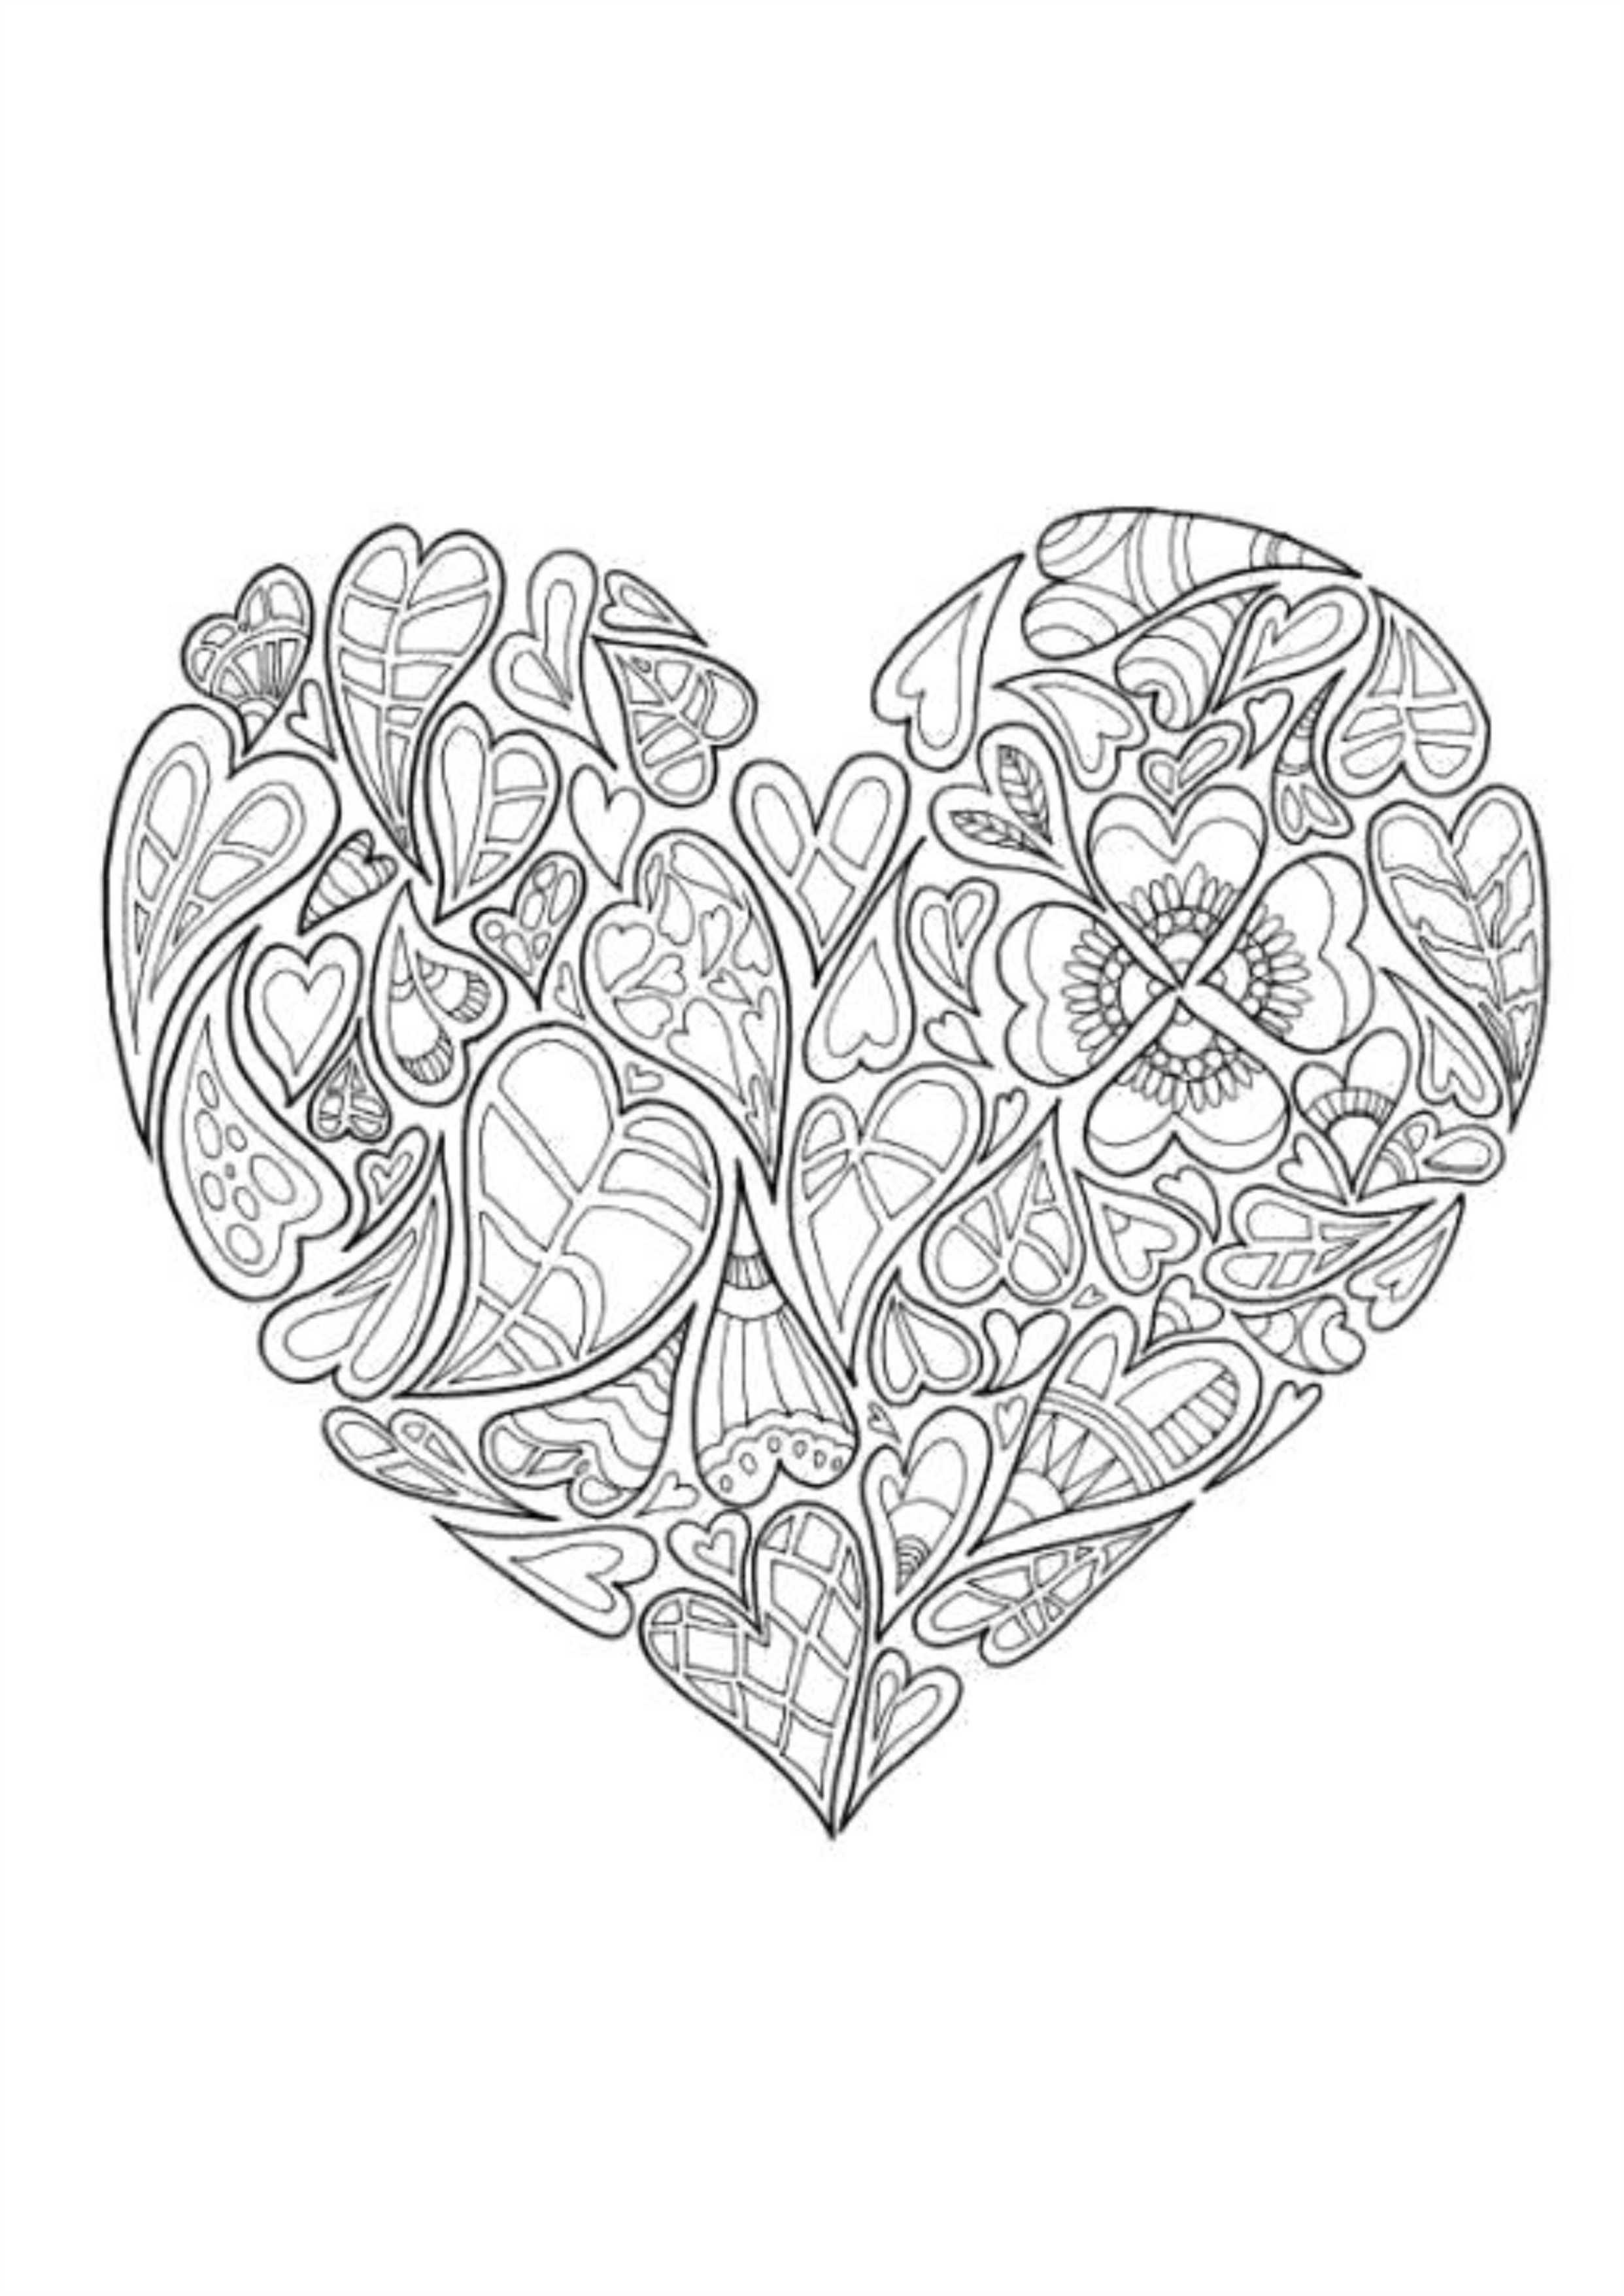 сердце из узора распечатать на а4 раскраски а4 формата